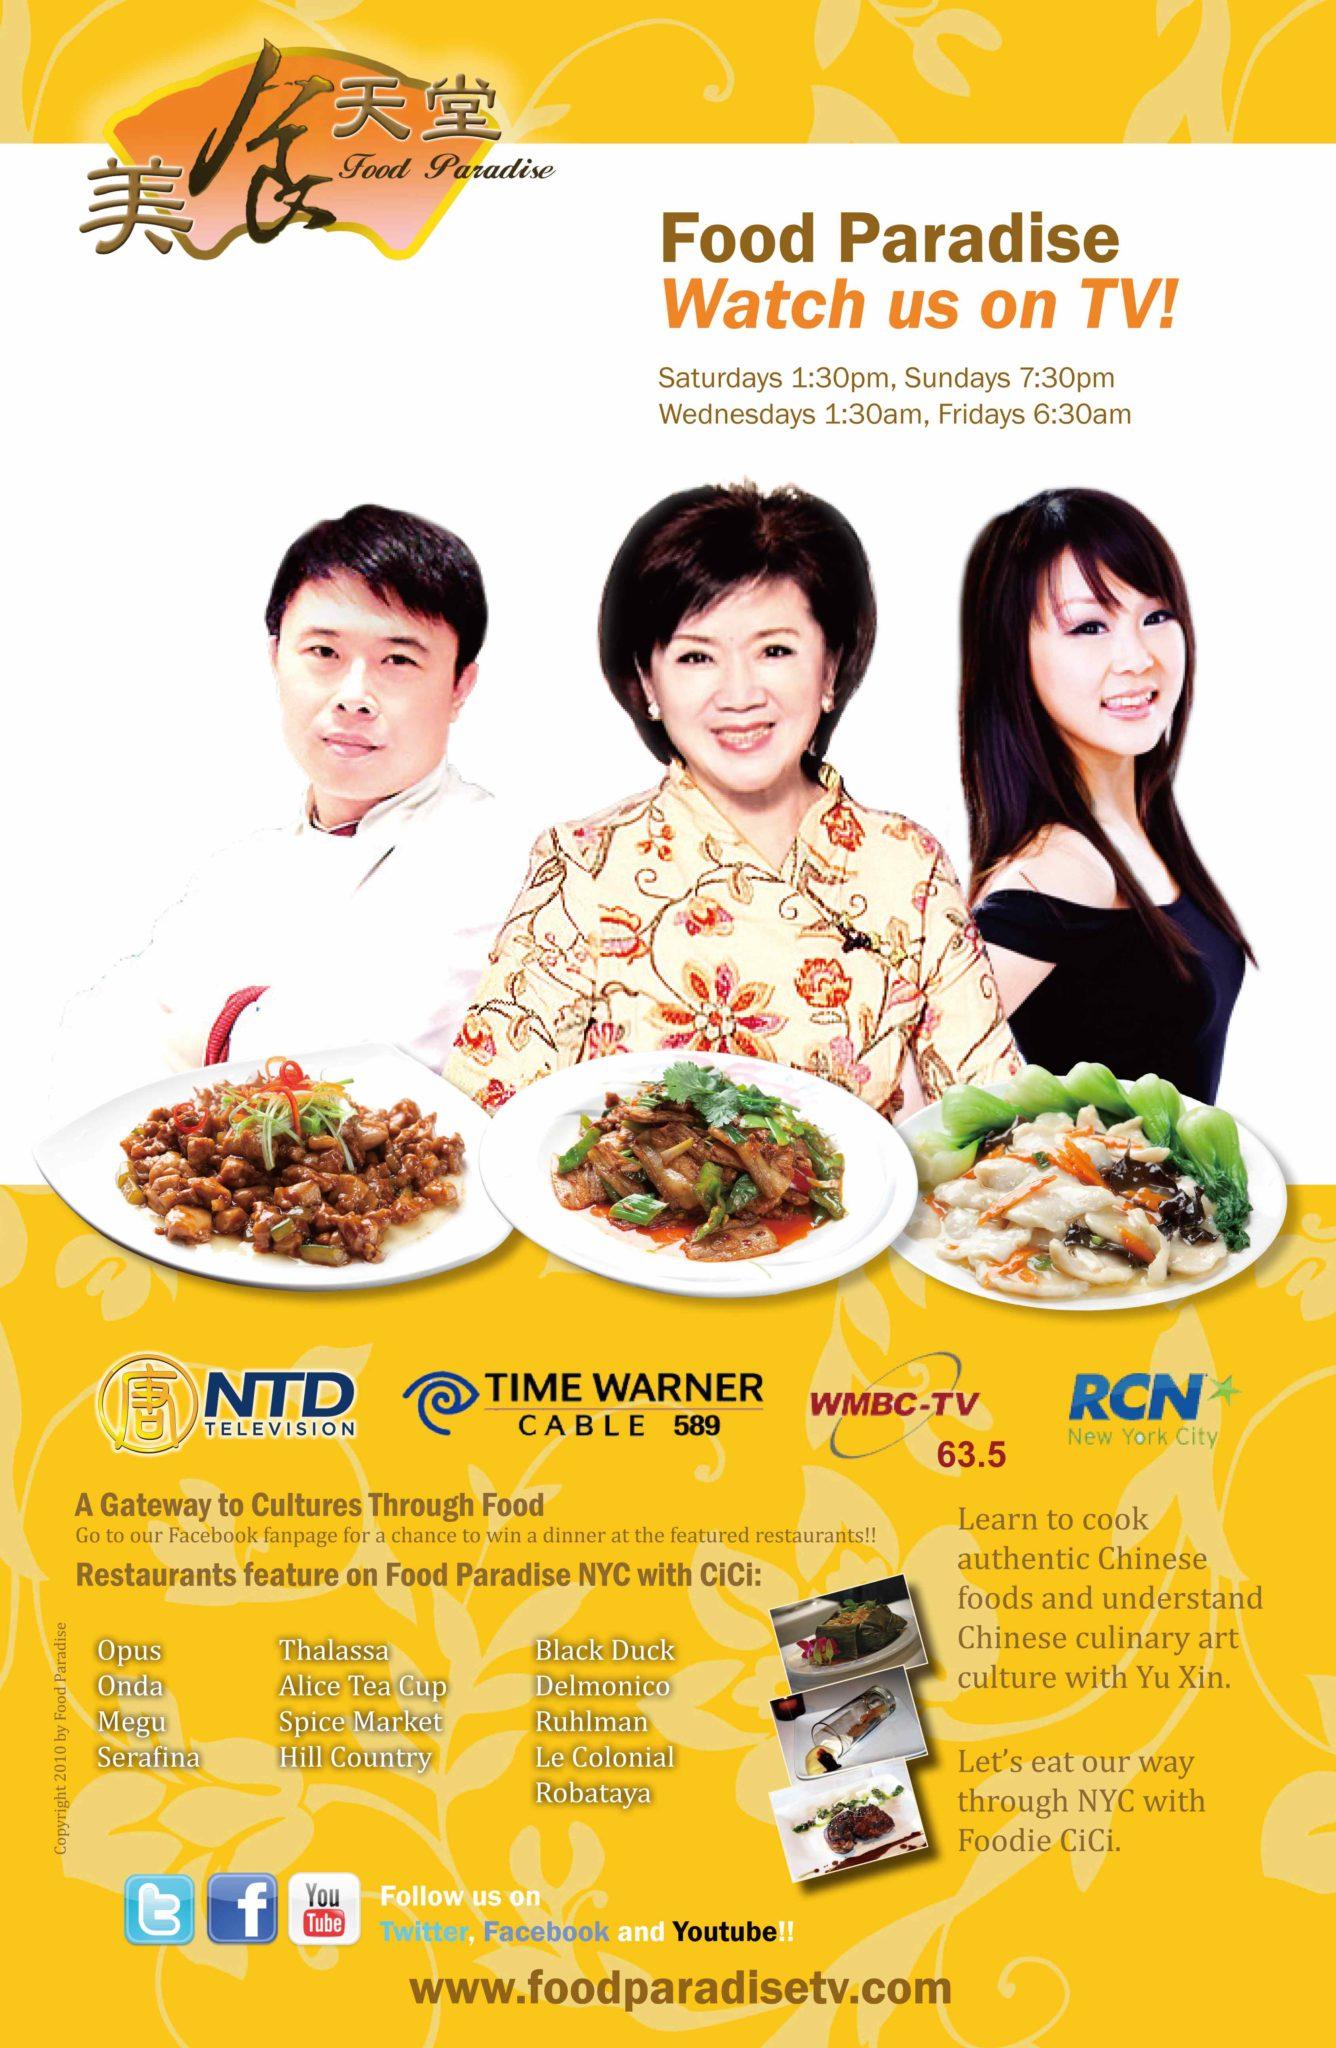 Foodparadise_poster_edited